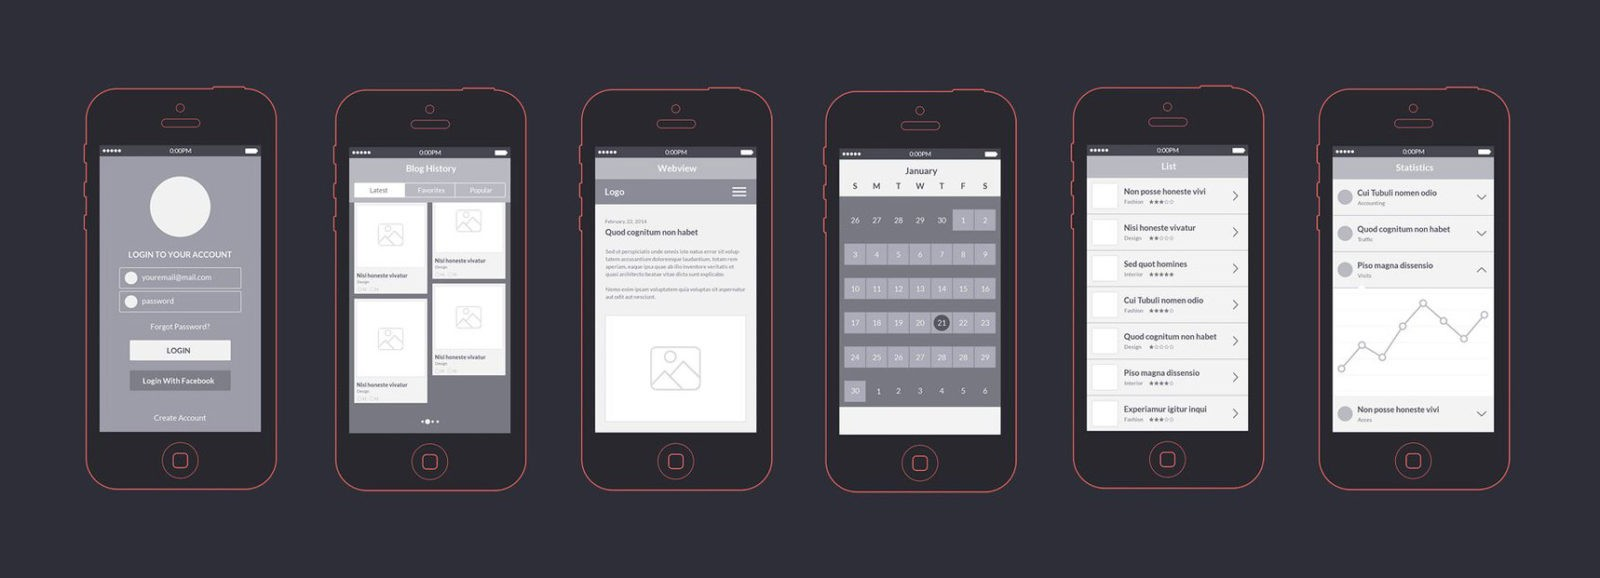 app-wireframe-samples